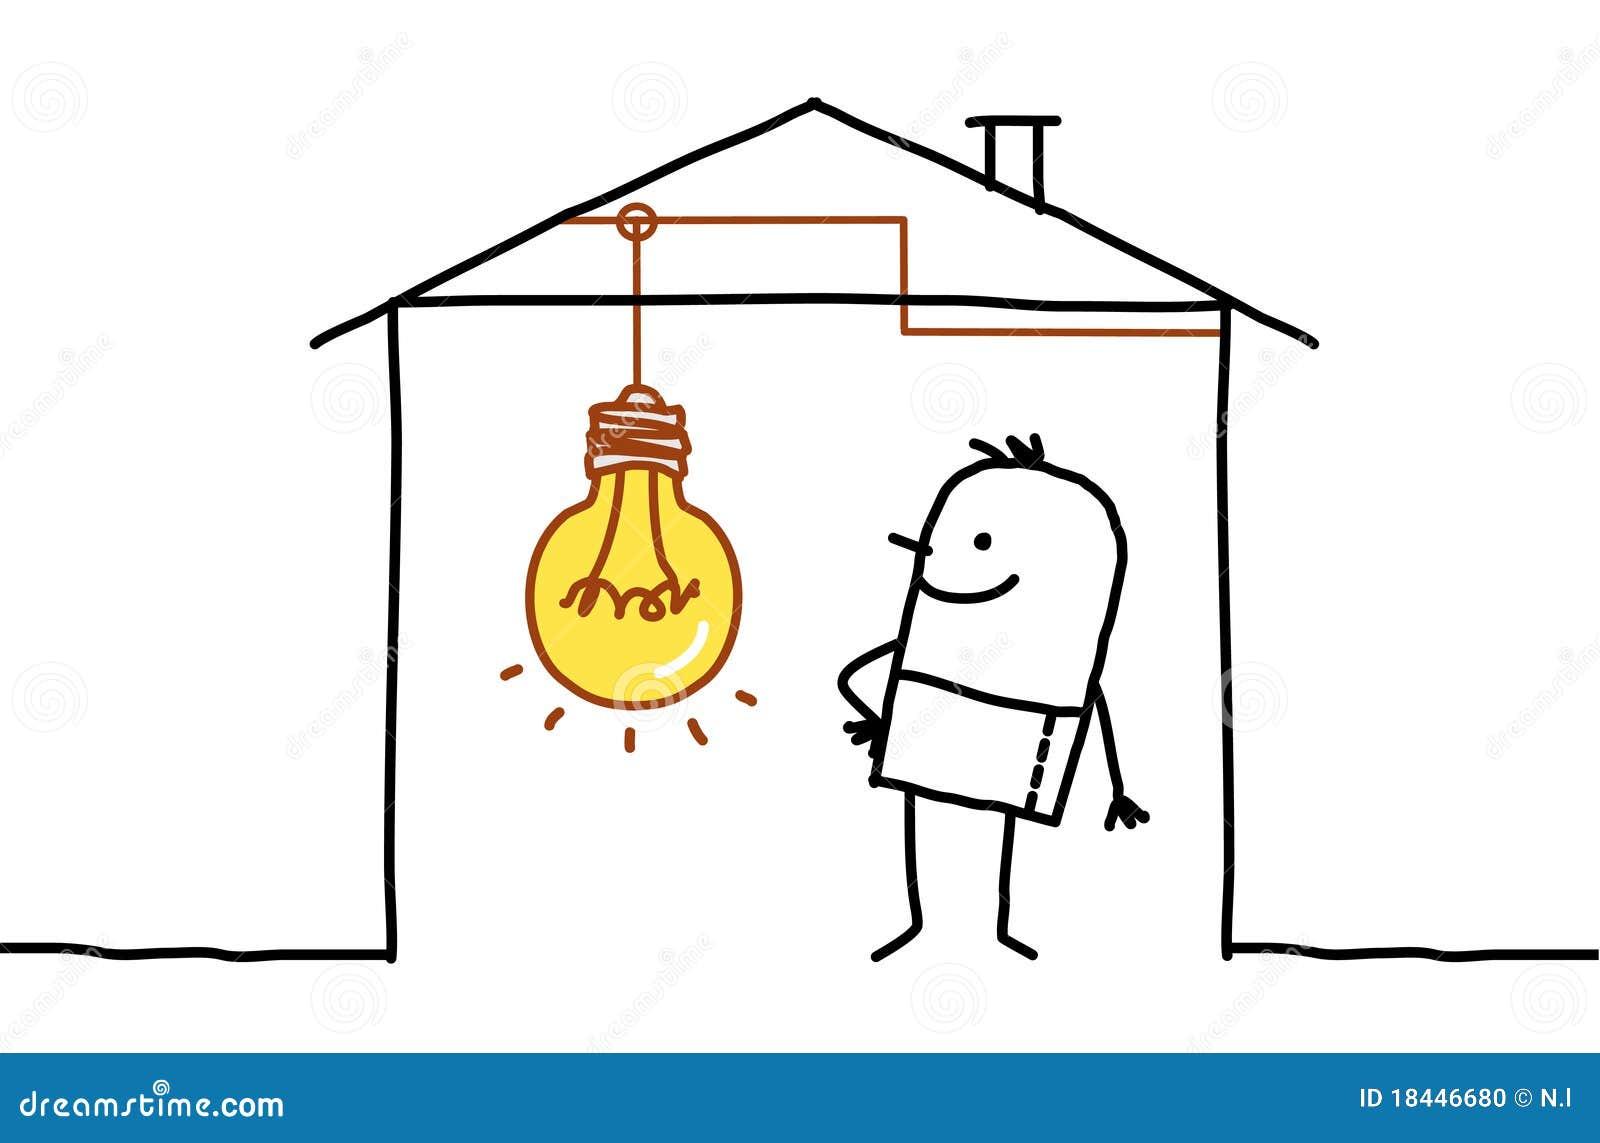 Man In House amp Light Bulb Stock Photo Image 18446680